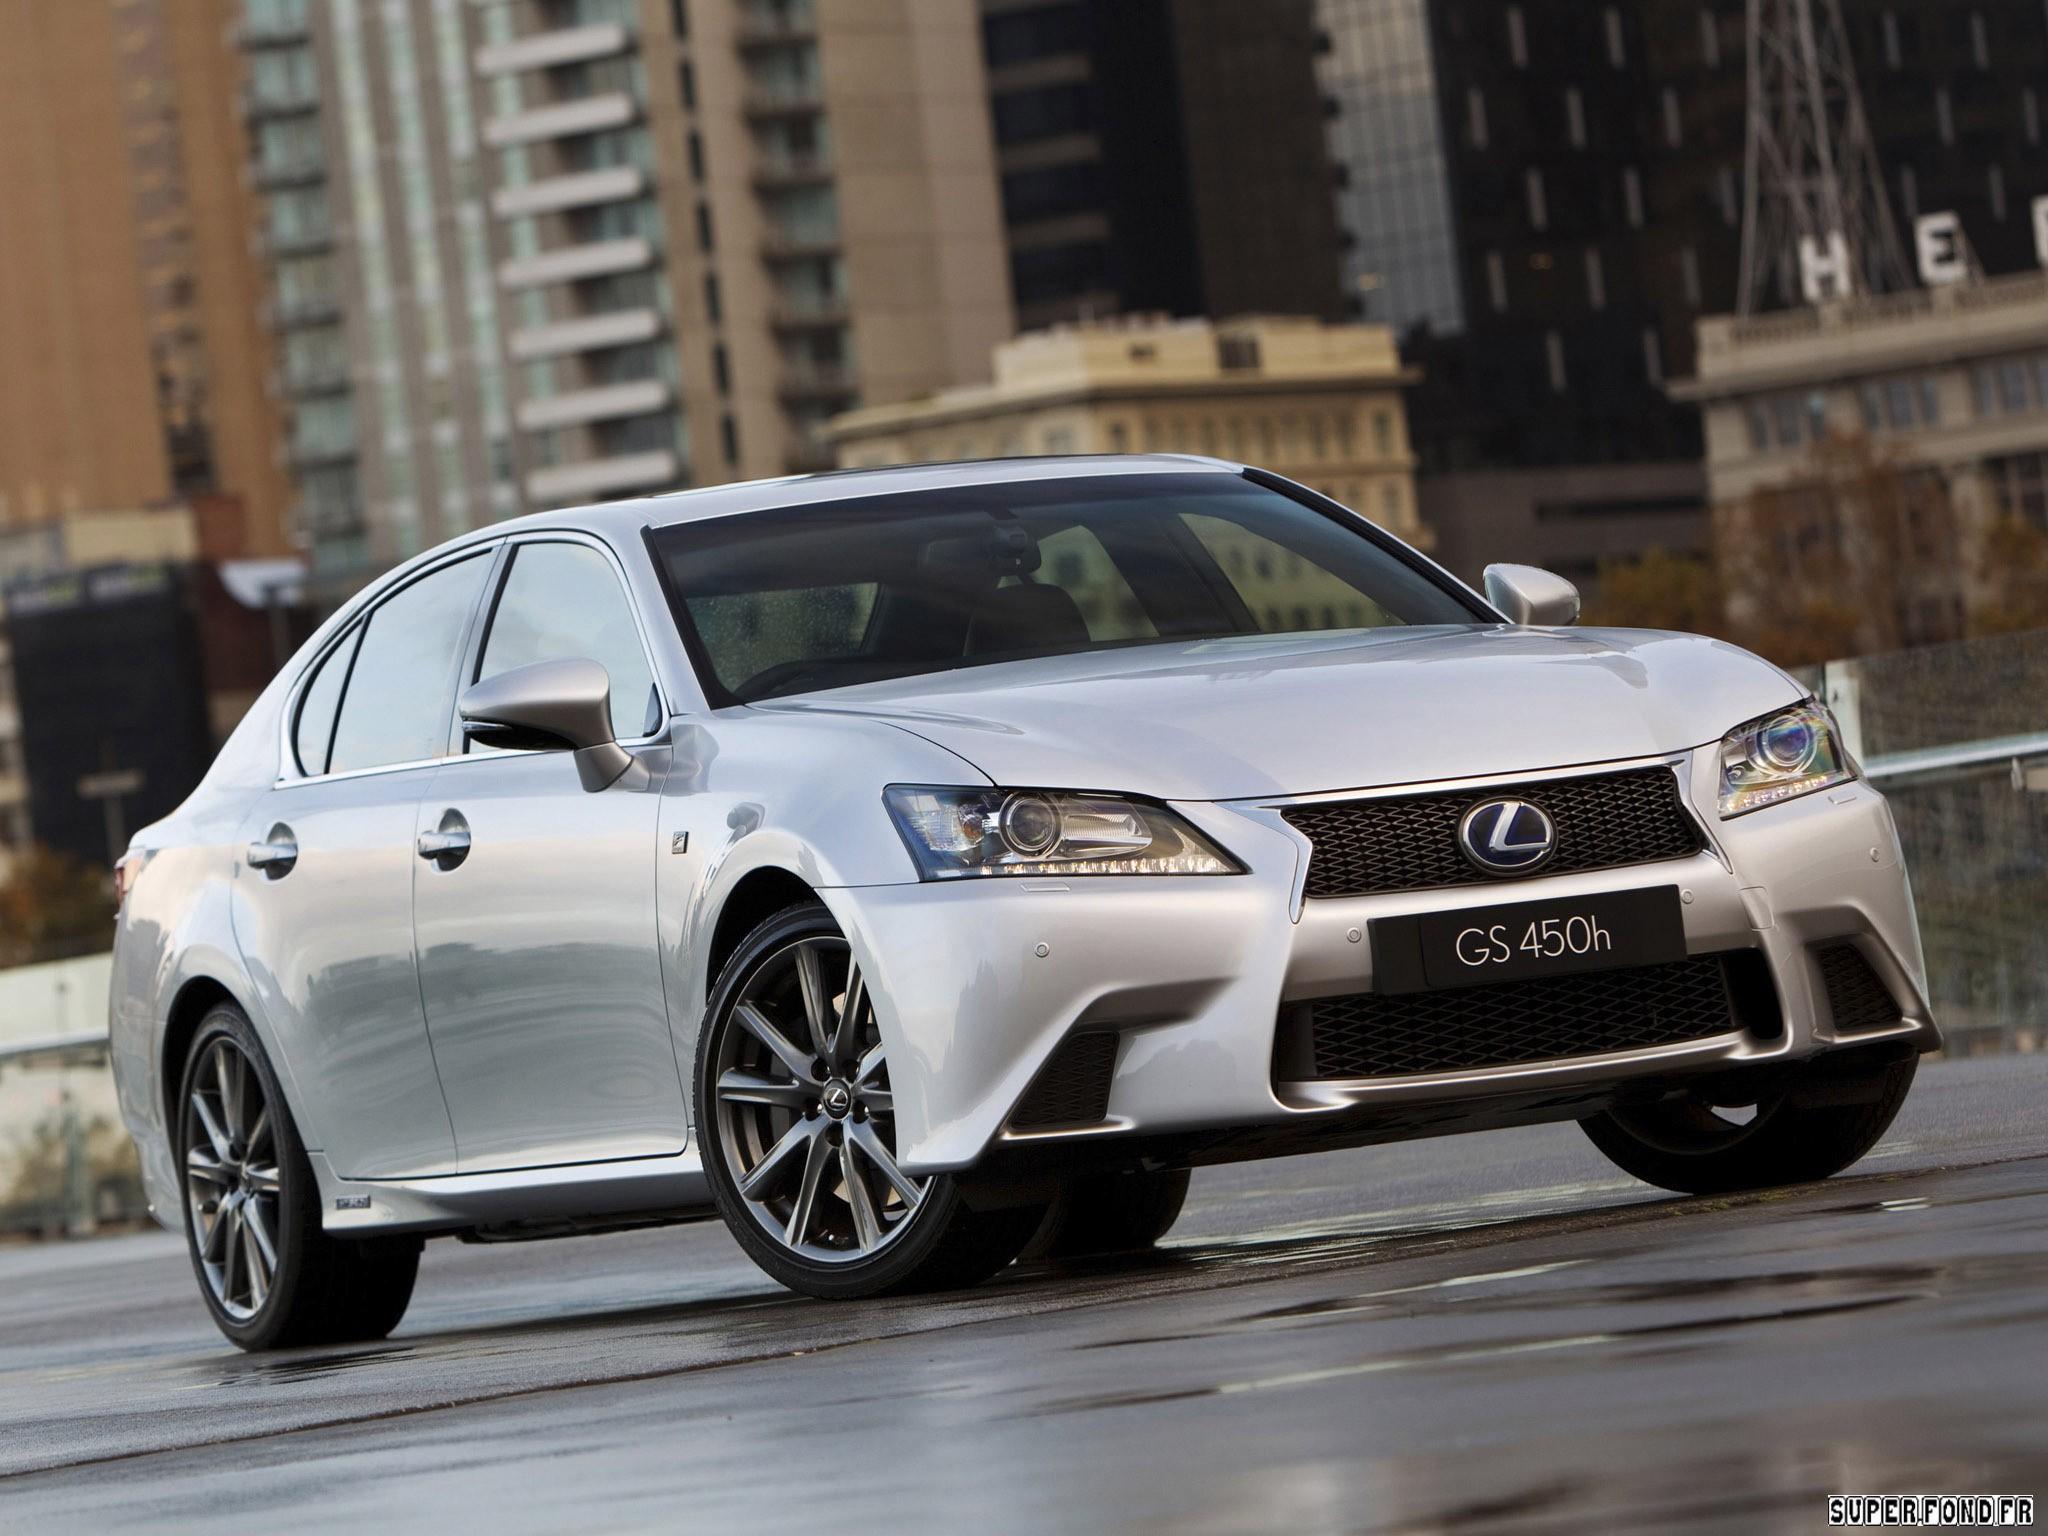 2012 Lexus GS 450h F-Sport Australia